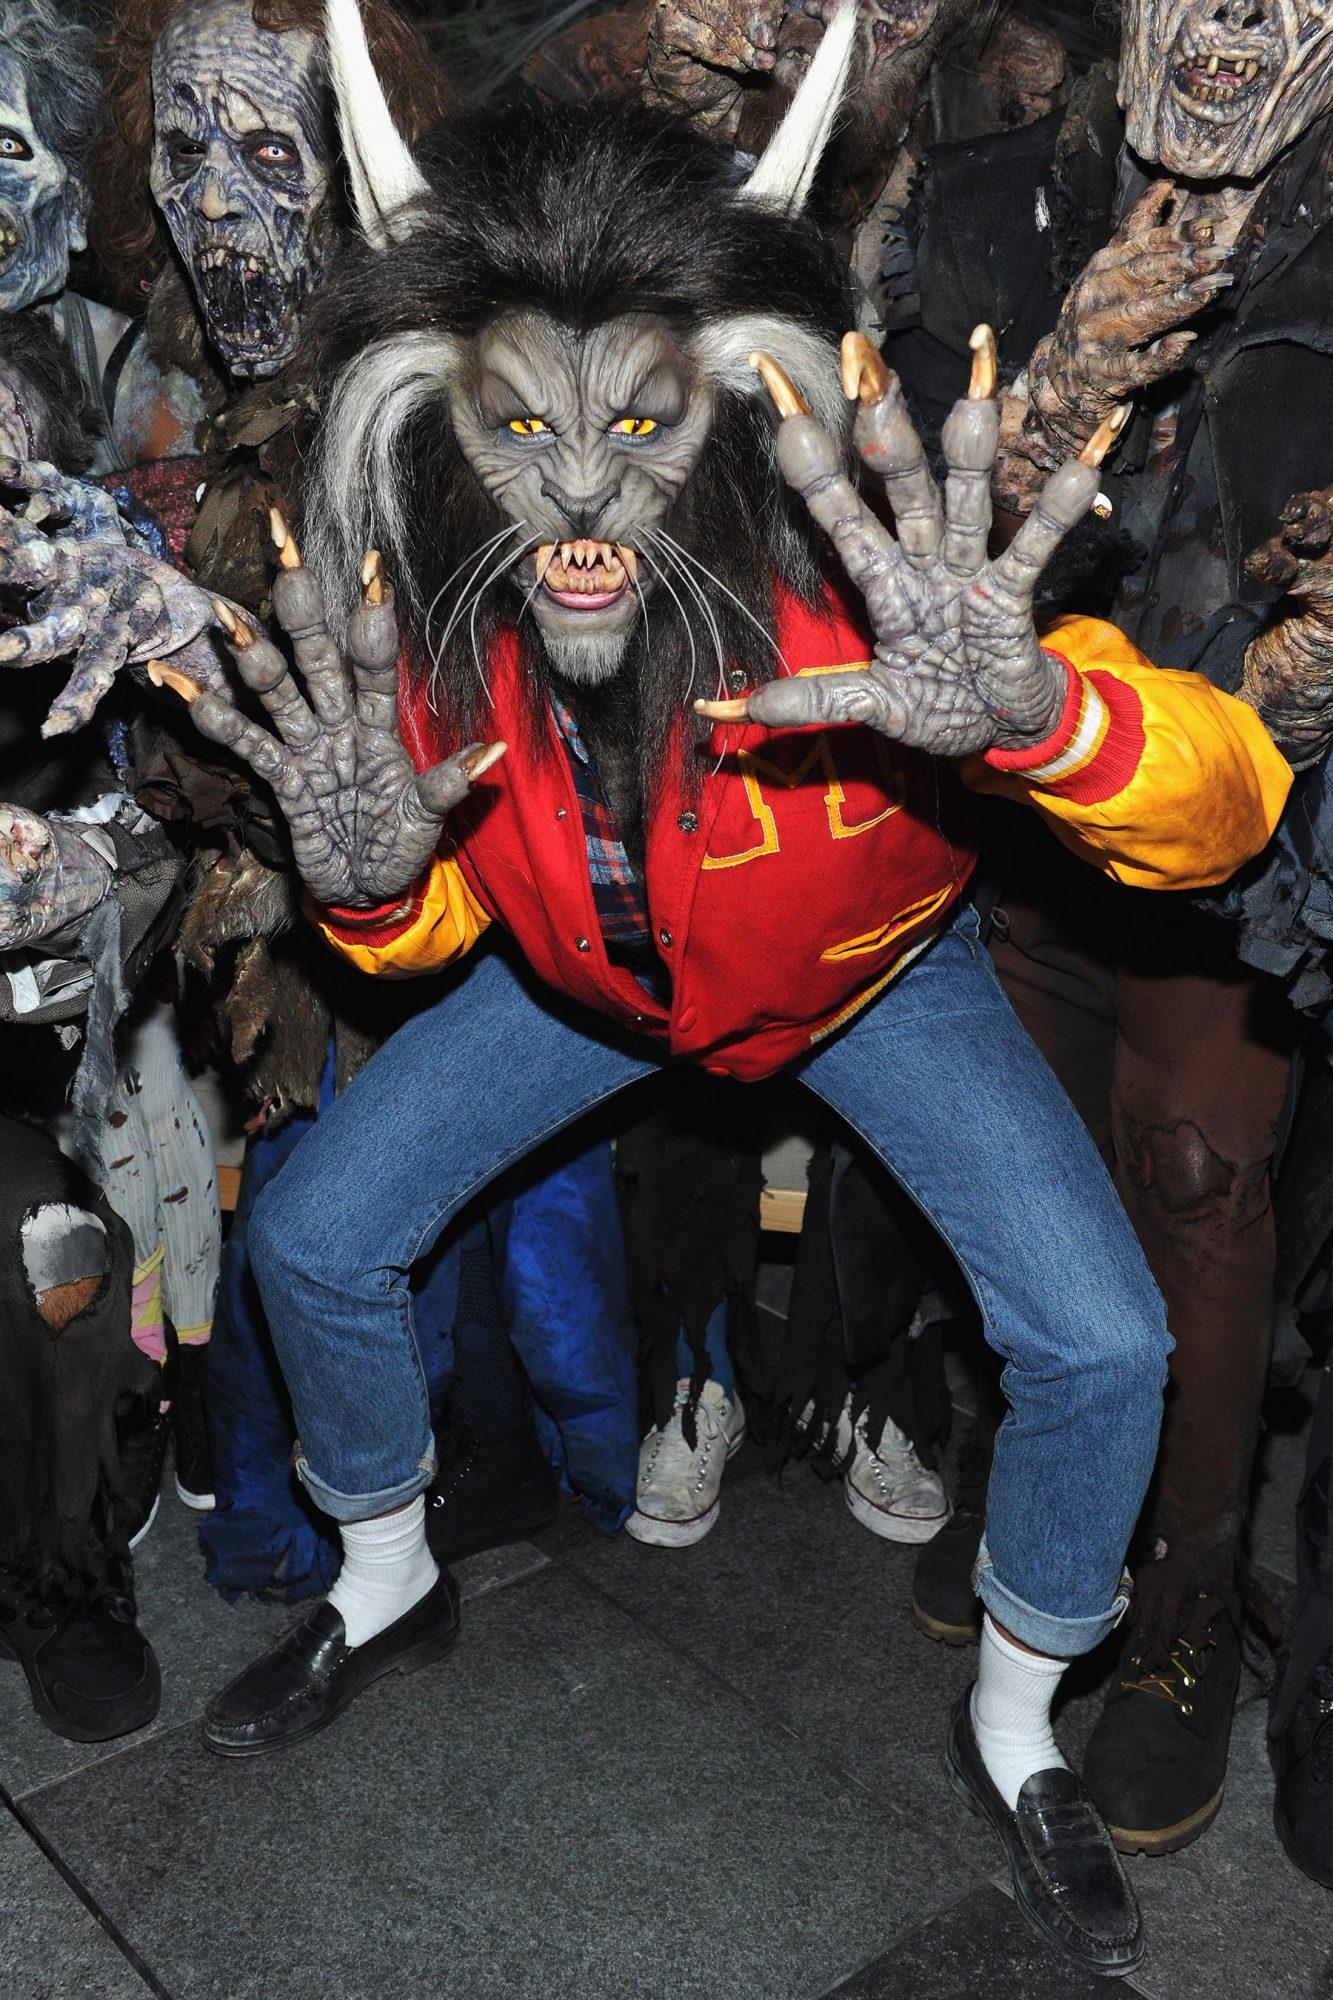 Heidi Klum's 18th Annual Halloween Party Sponsored By SVEDKA Vodka And Party City